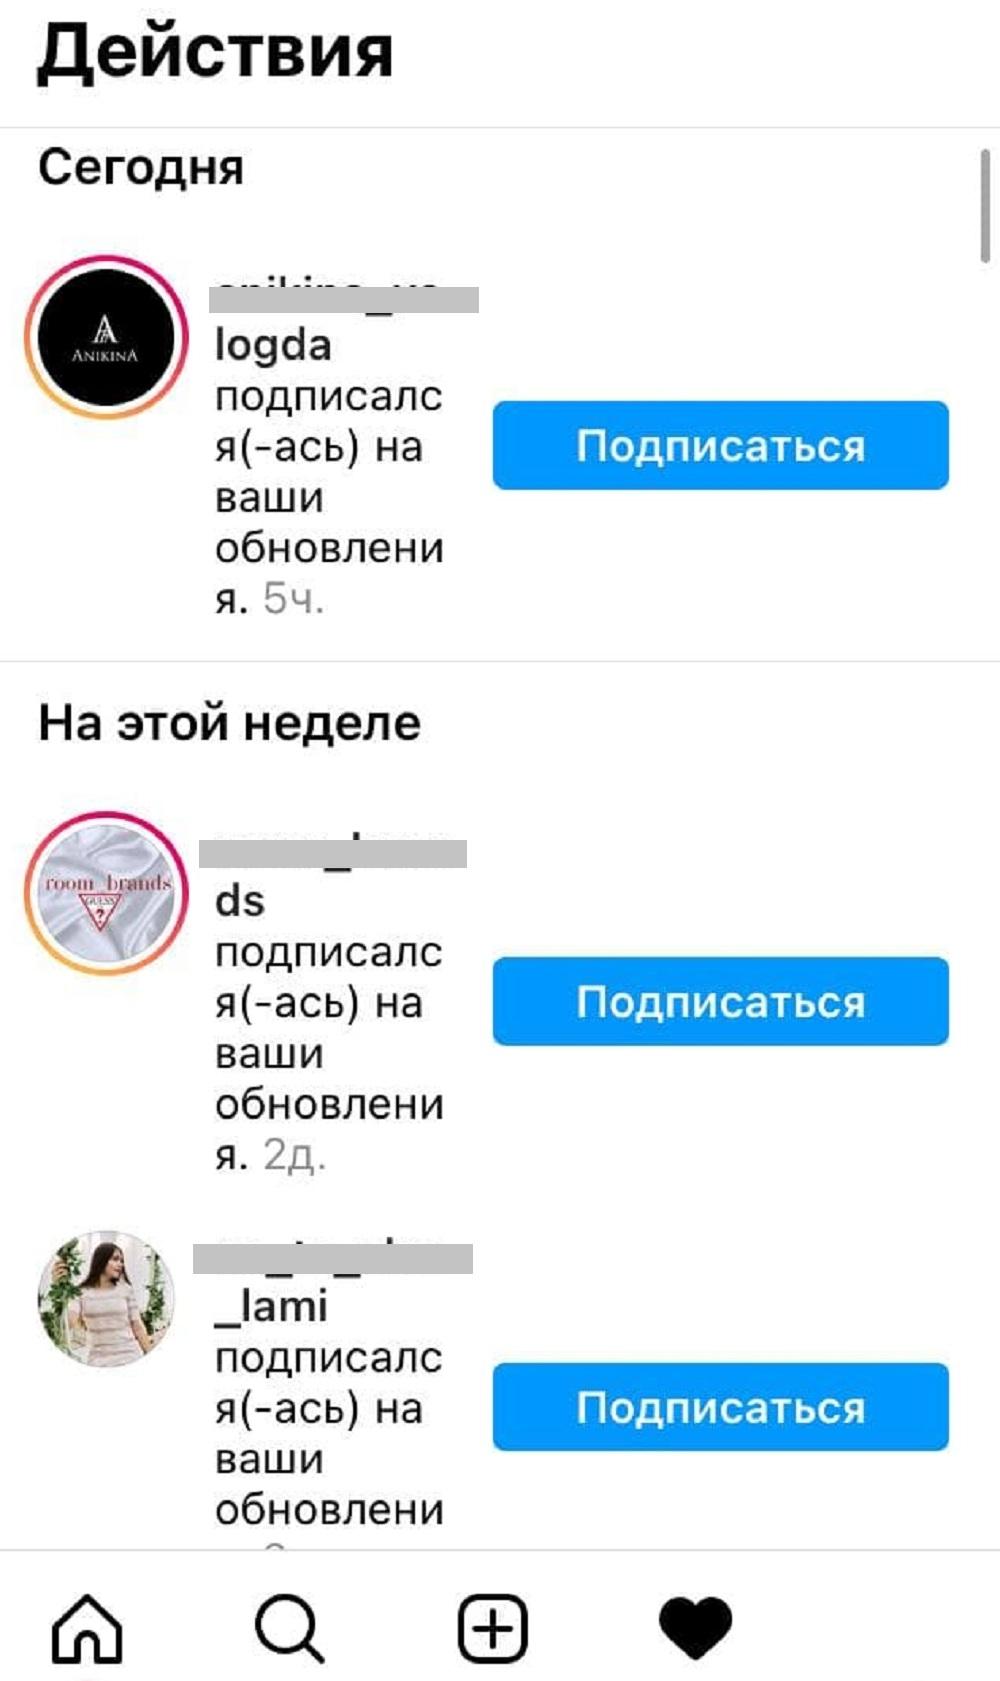 платная накрутка инстаграм аккаунта